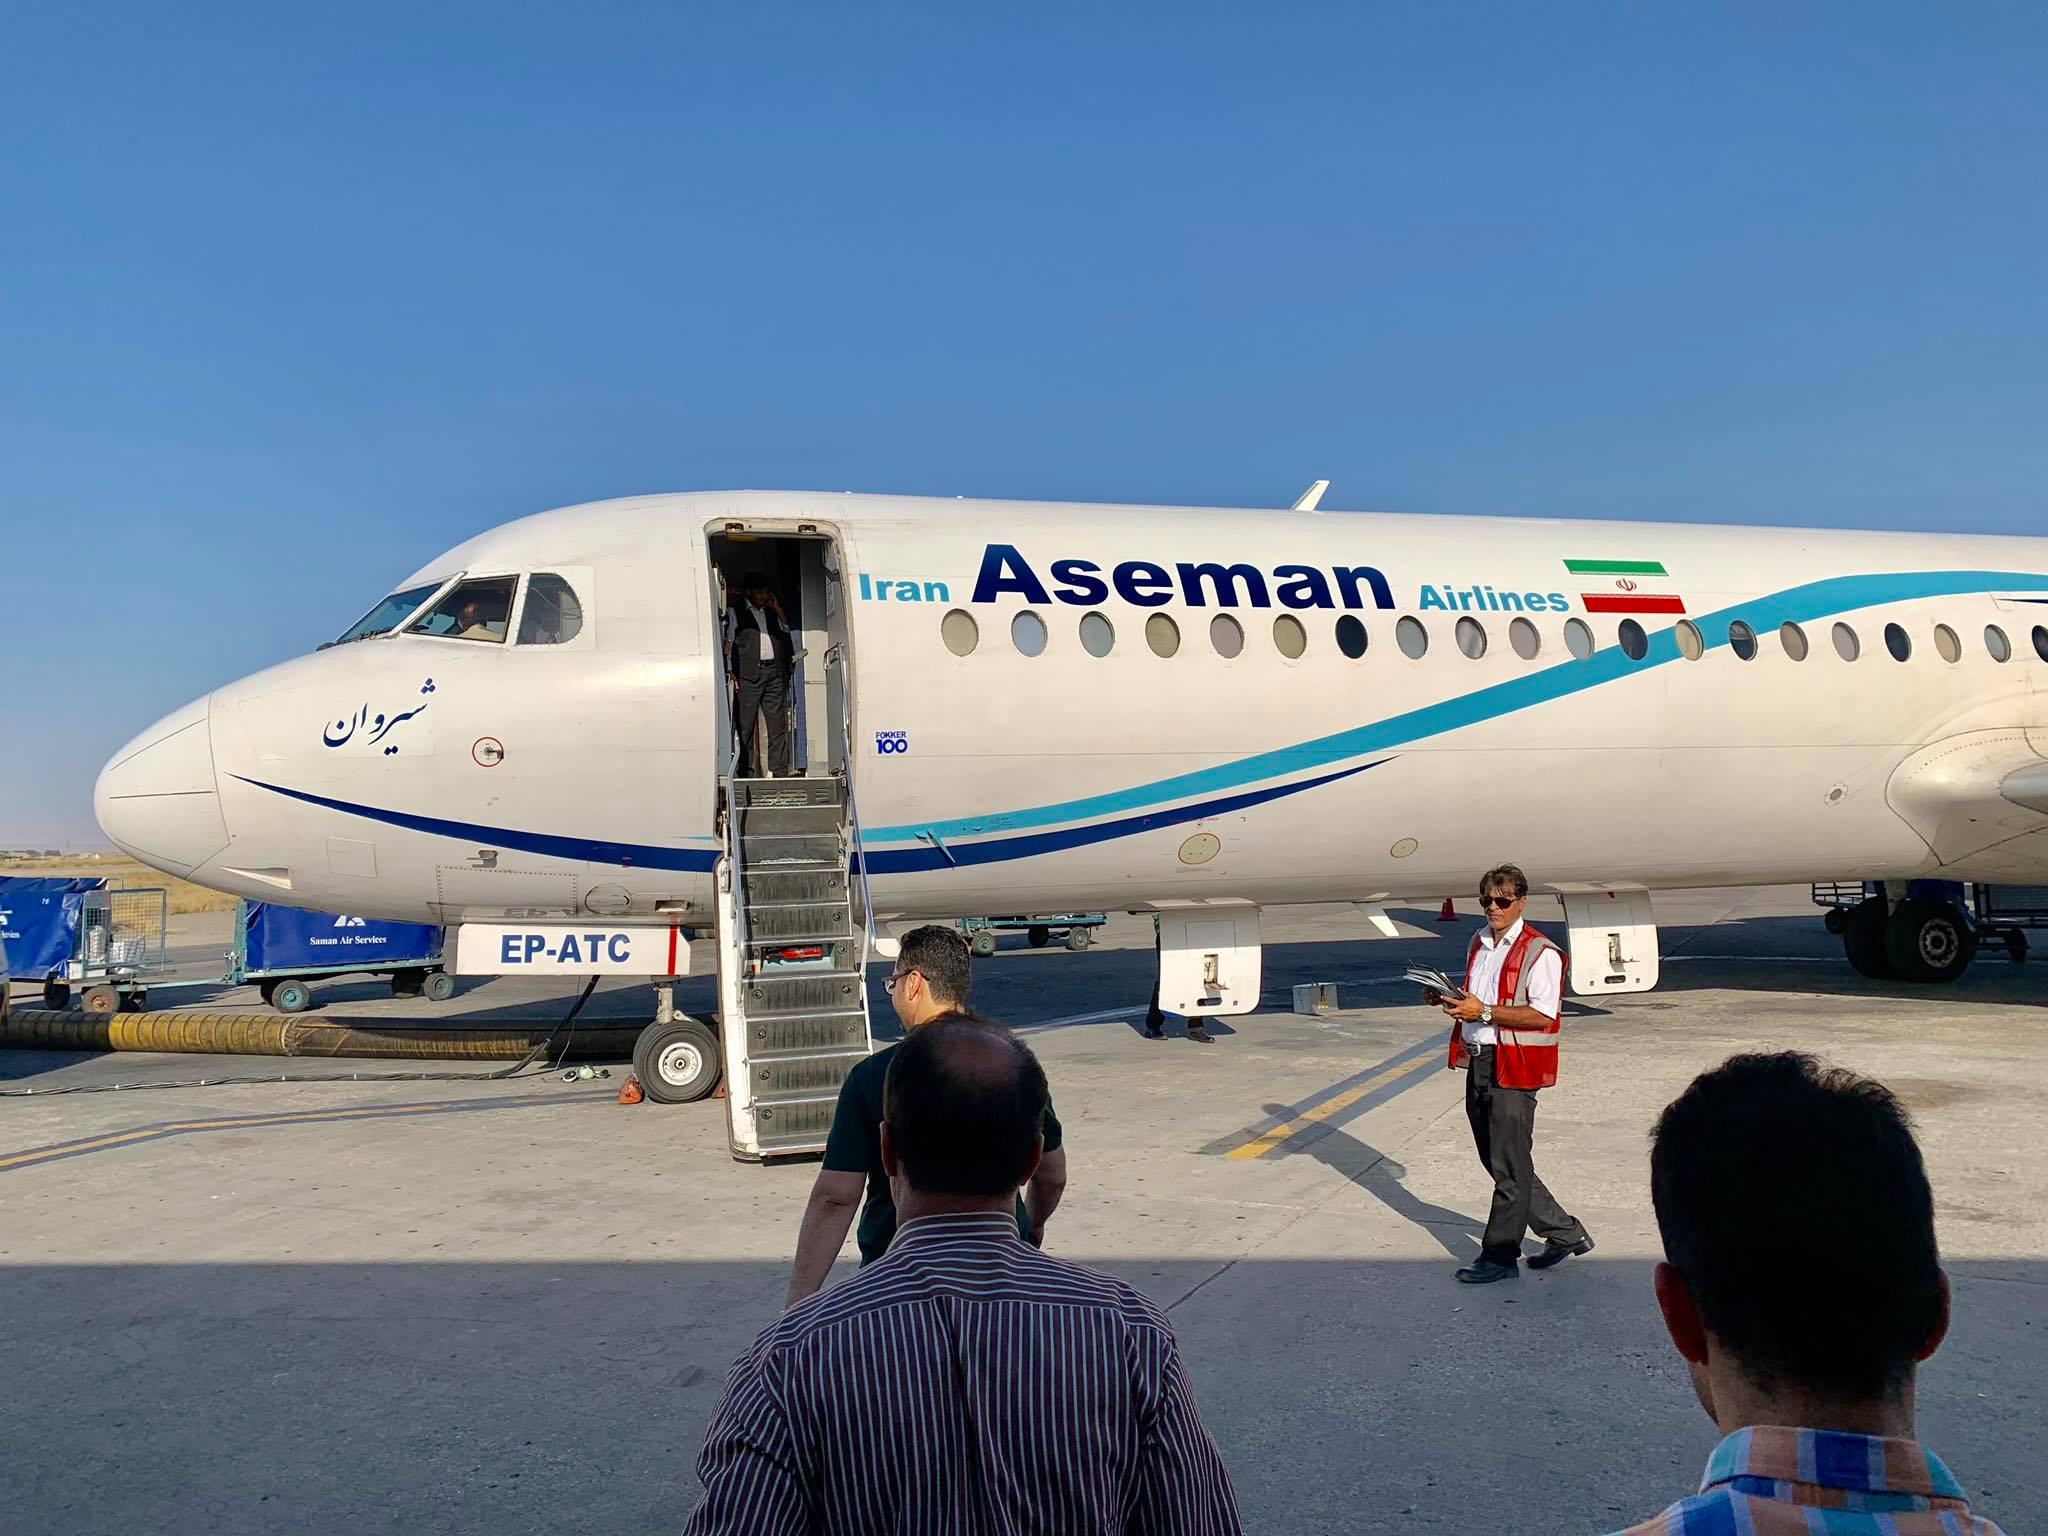 Kach Solo Travels in 2019 Mashhad to Shiraz.jpg